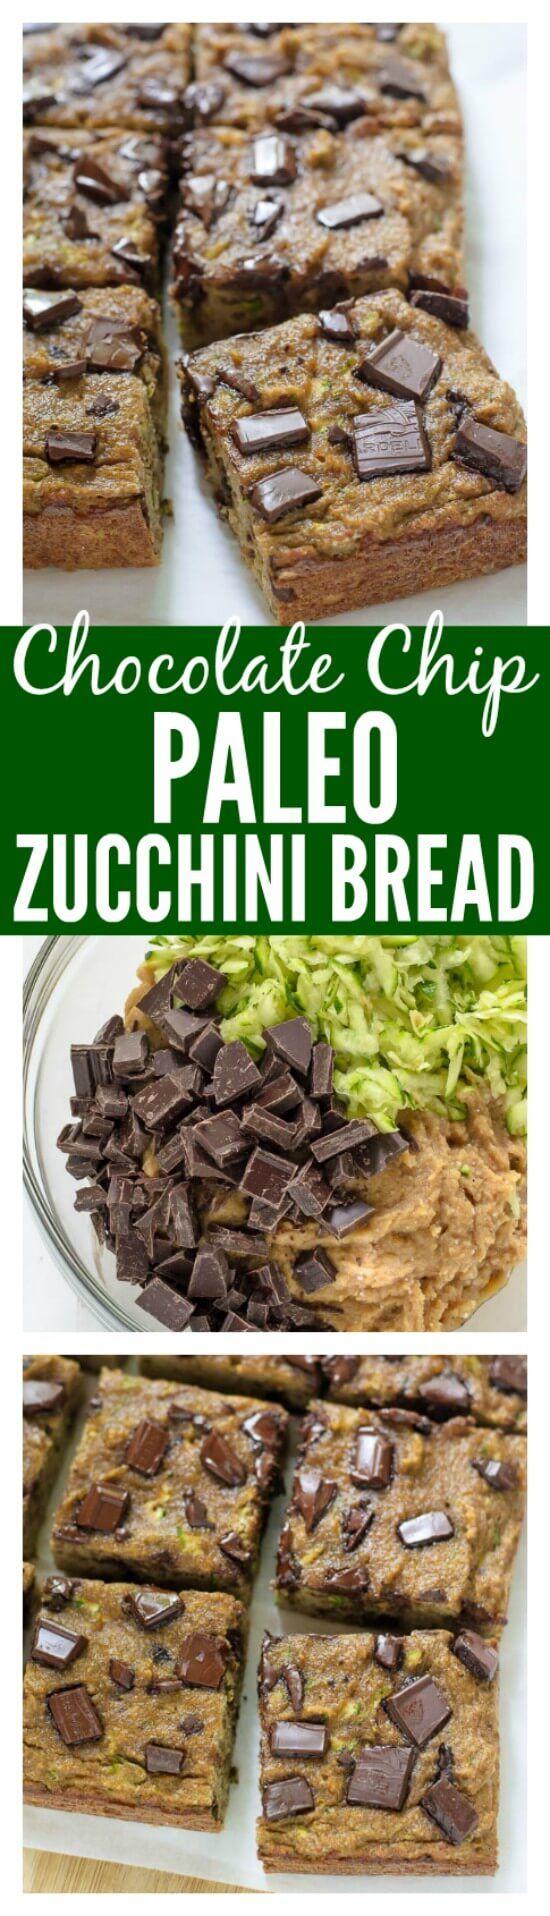 Chocolate Chip Paleo Zucchini Bread. Grain free, dairy free